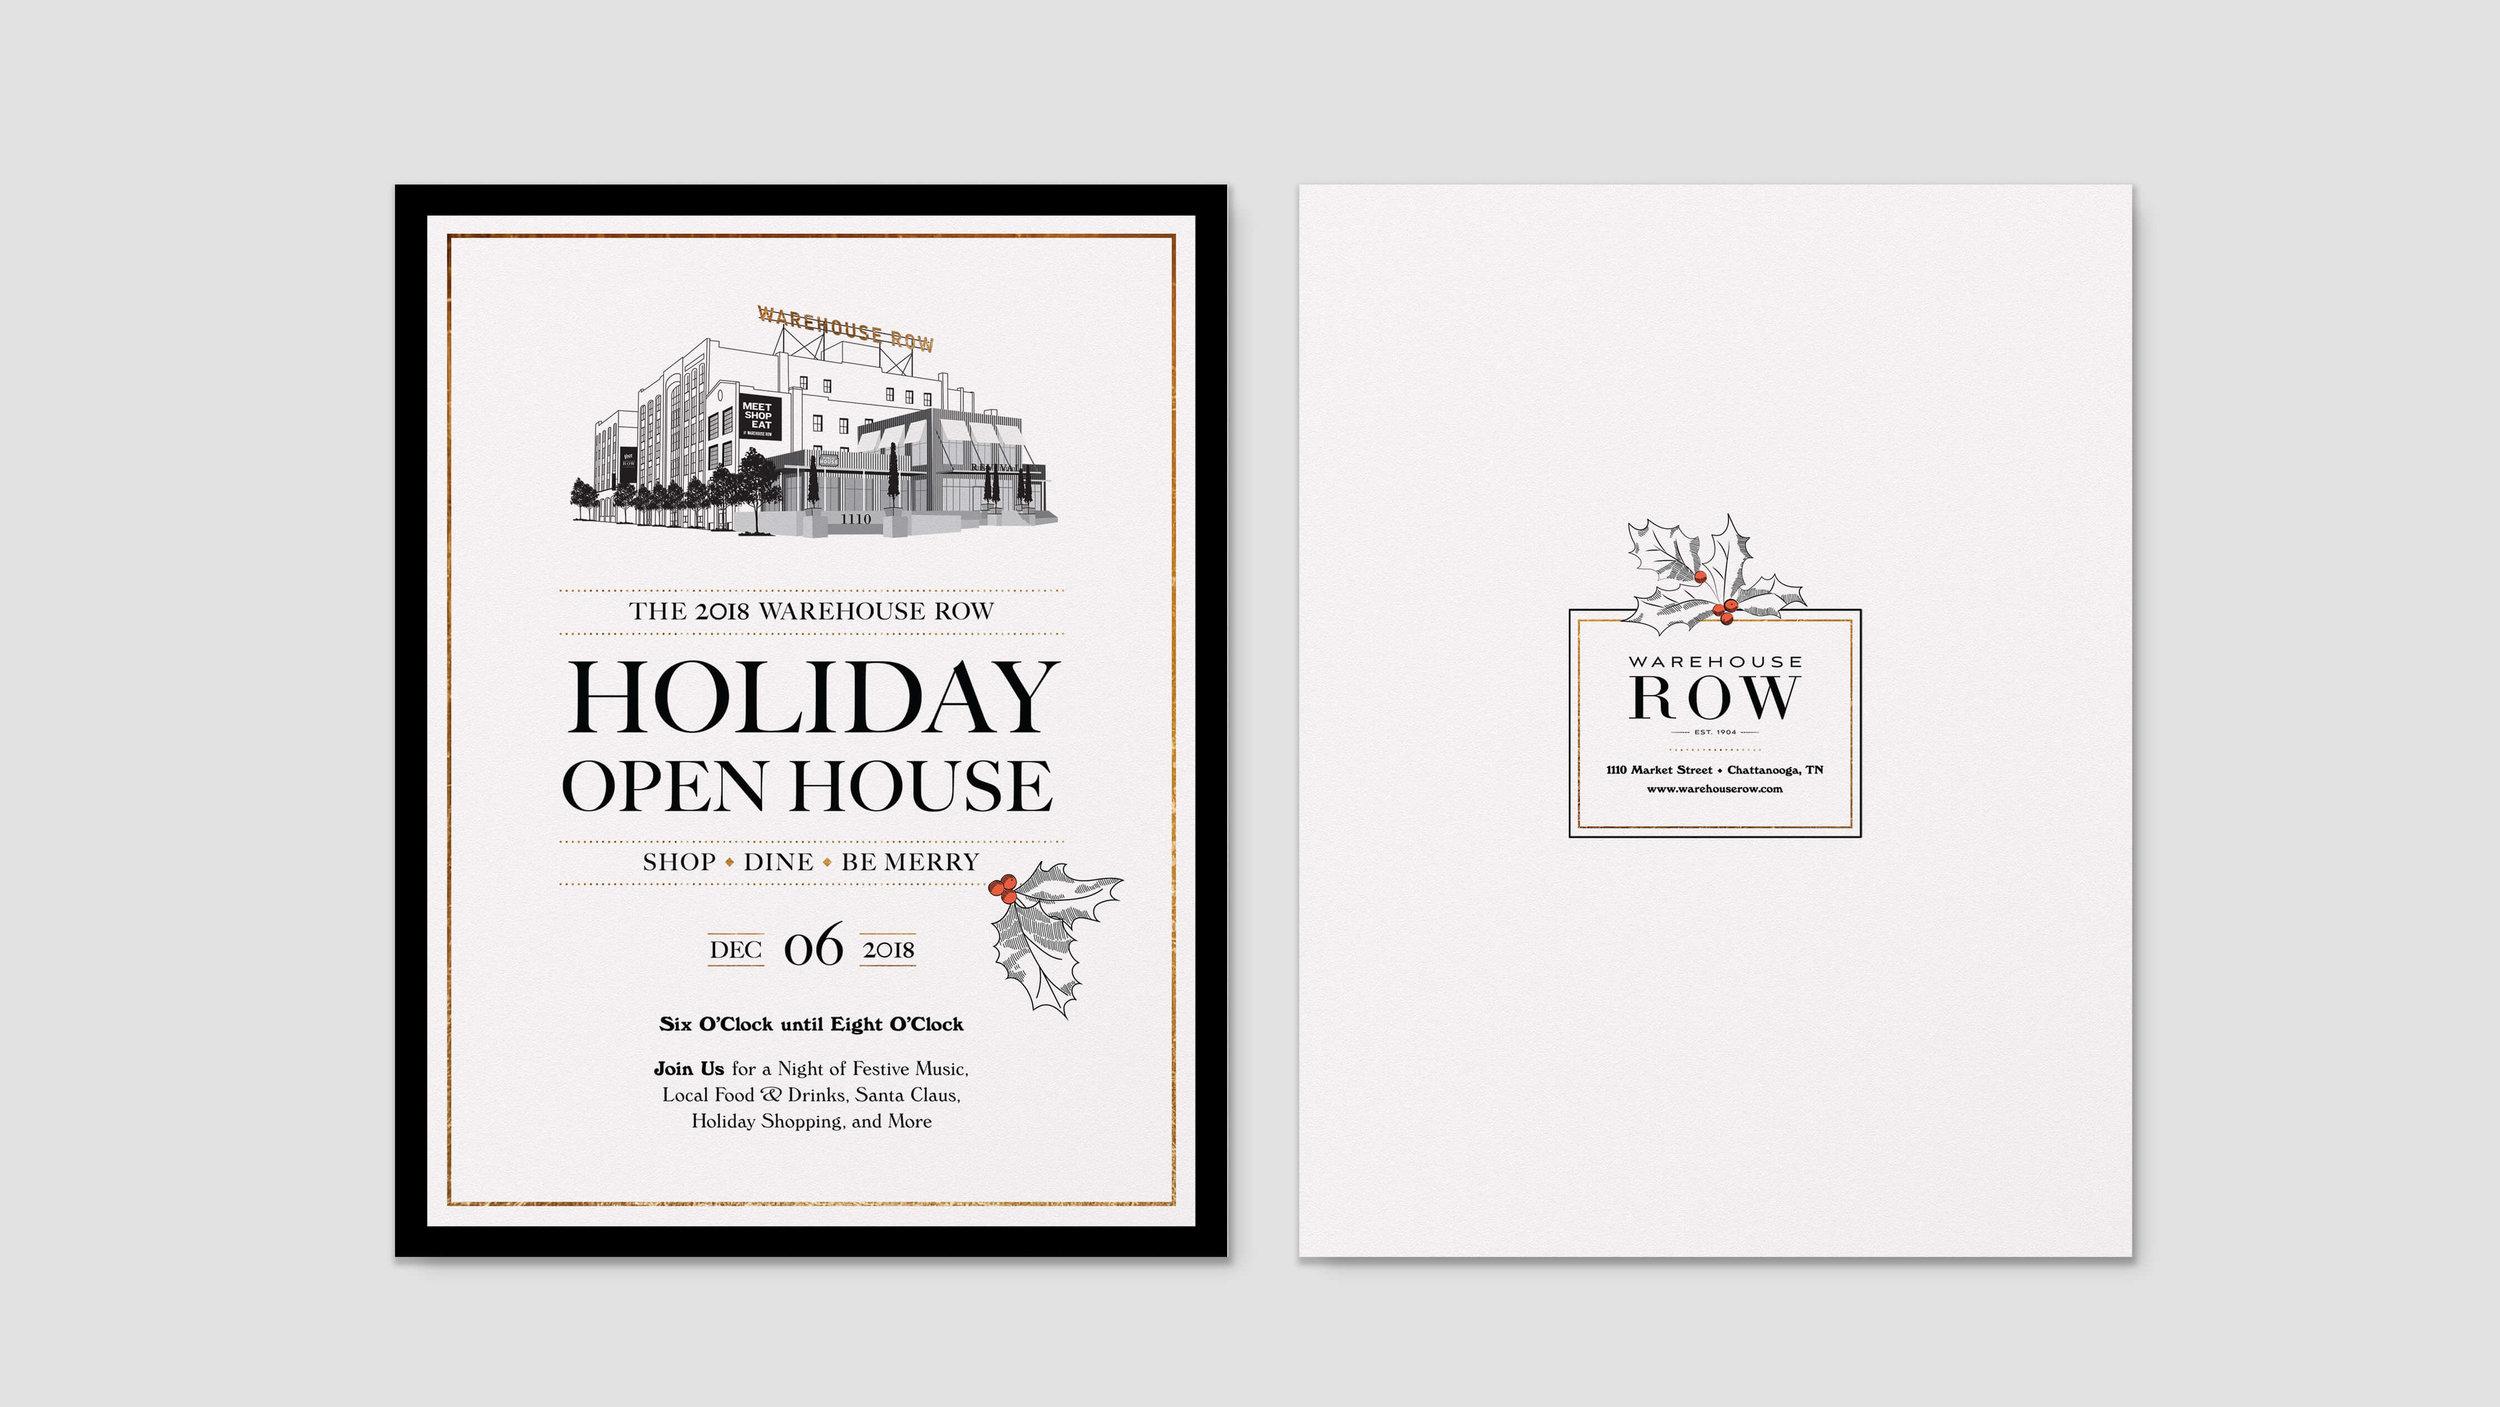 WarehouseRow-Invitation-ChristmasParty2018.jpg